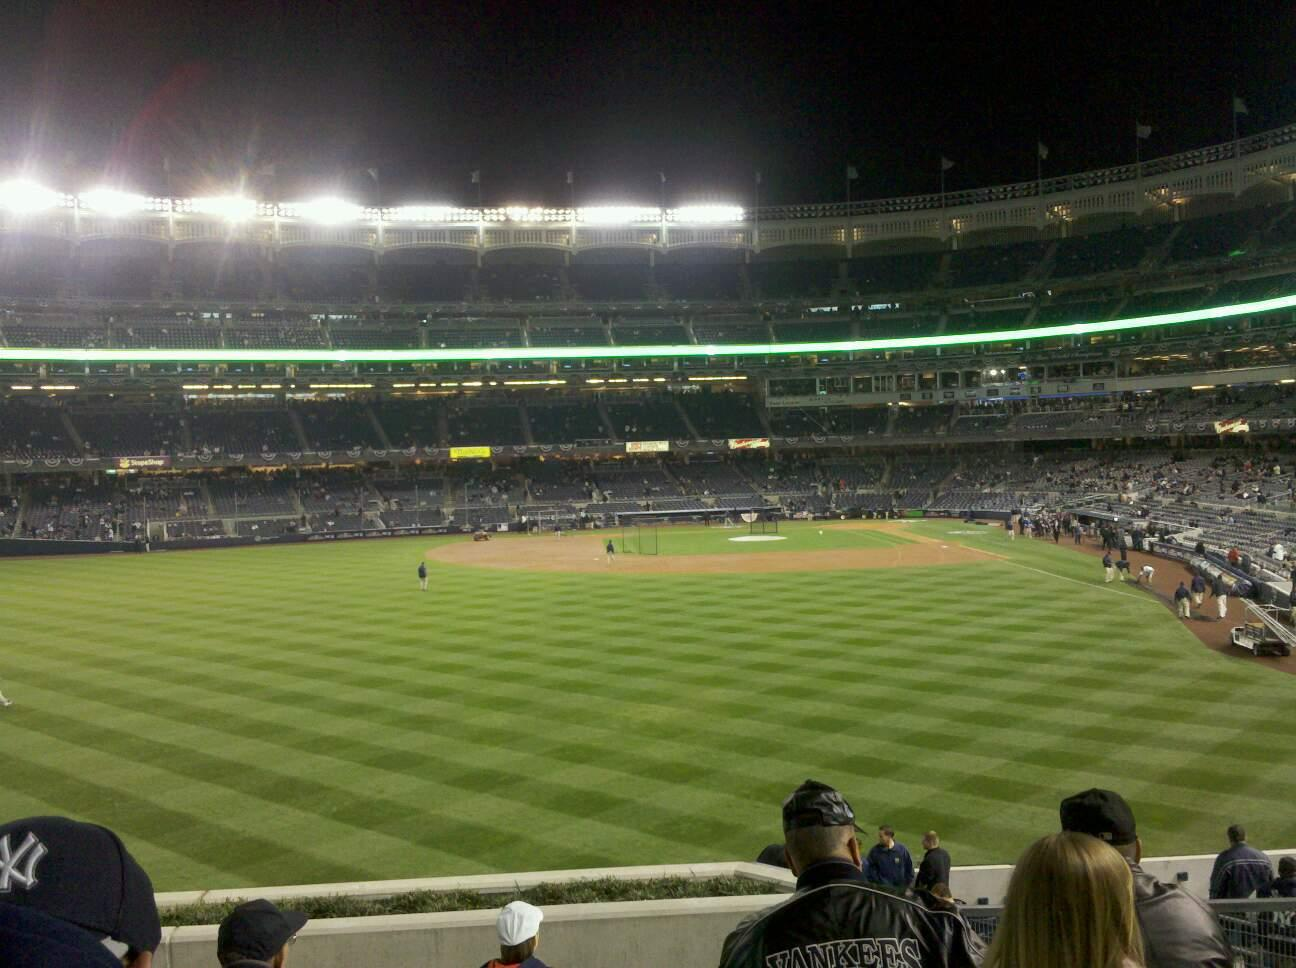 Yankee Stadium Secção 235 Fila 10 Lugar 10